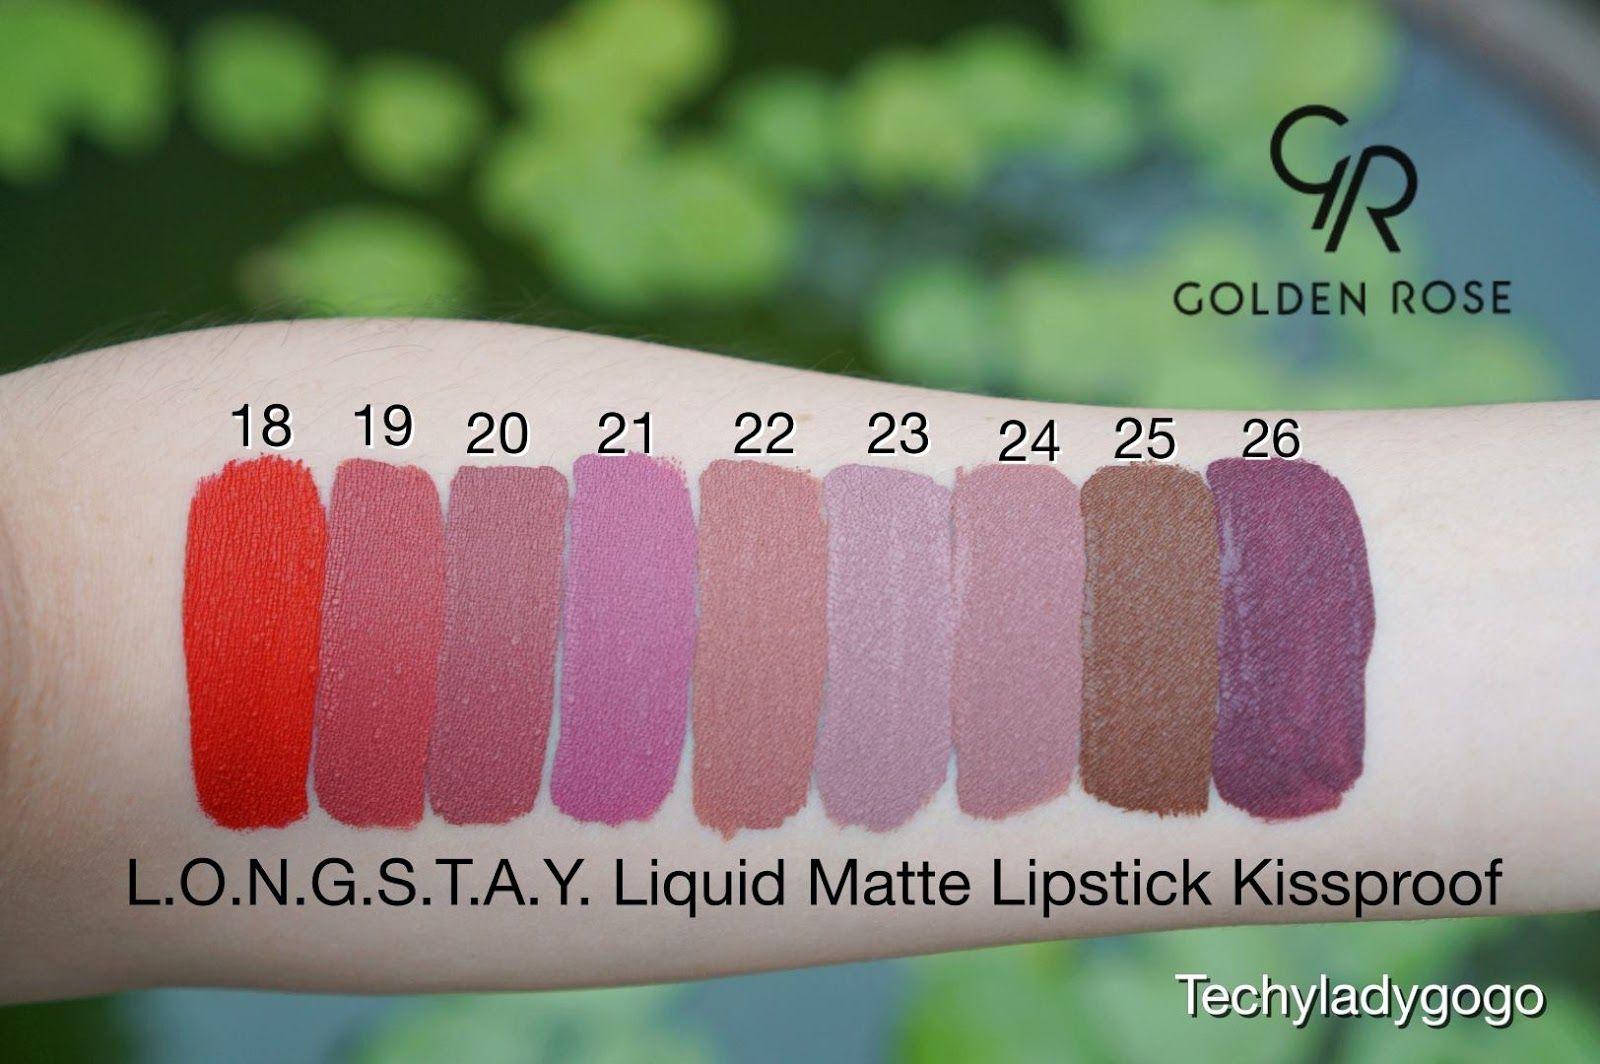 Golden Rose Longstay Liquid Matte Lipstick Kissproof 9 สใหม เบอร